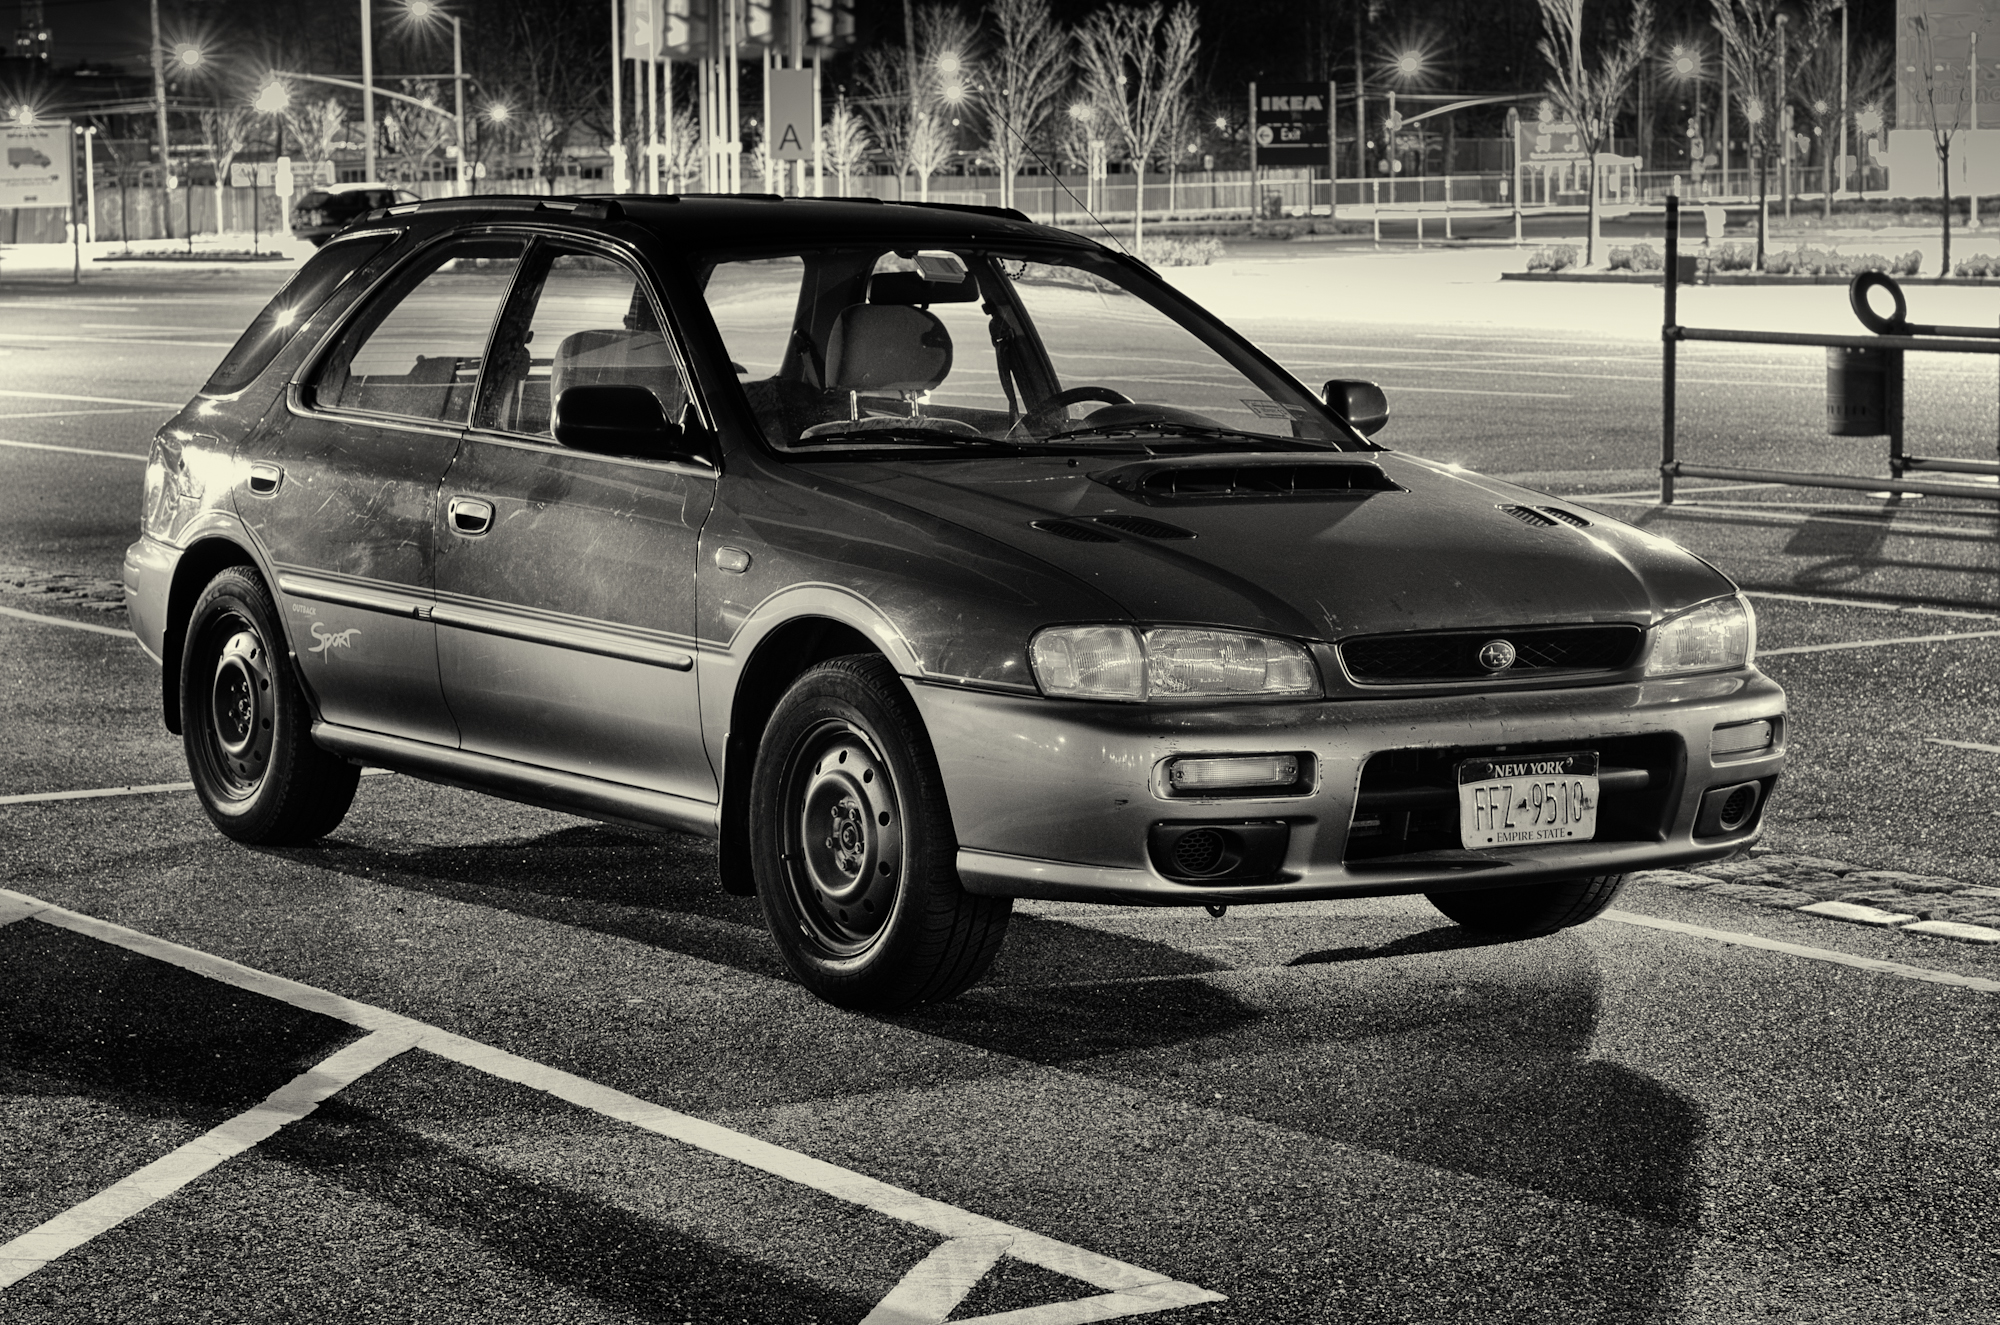 Syl's car